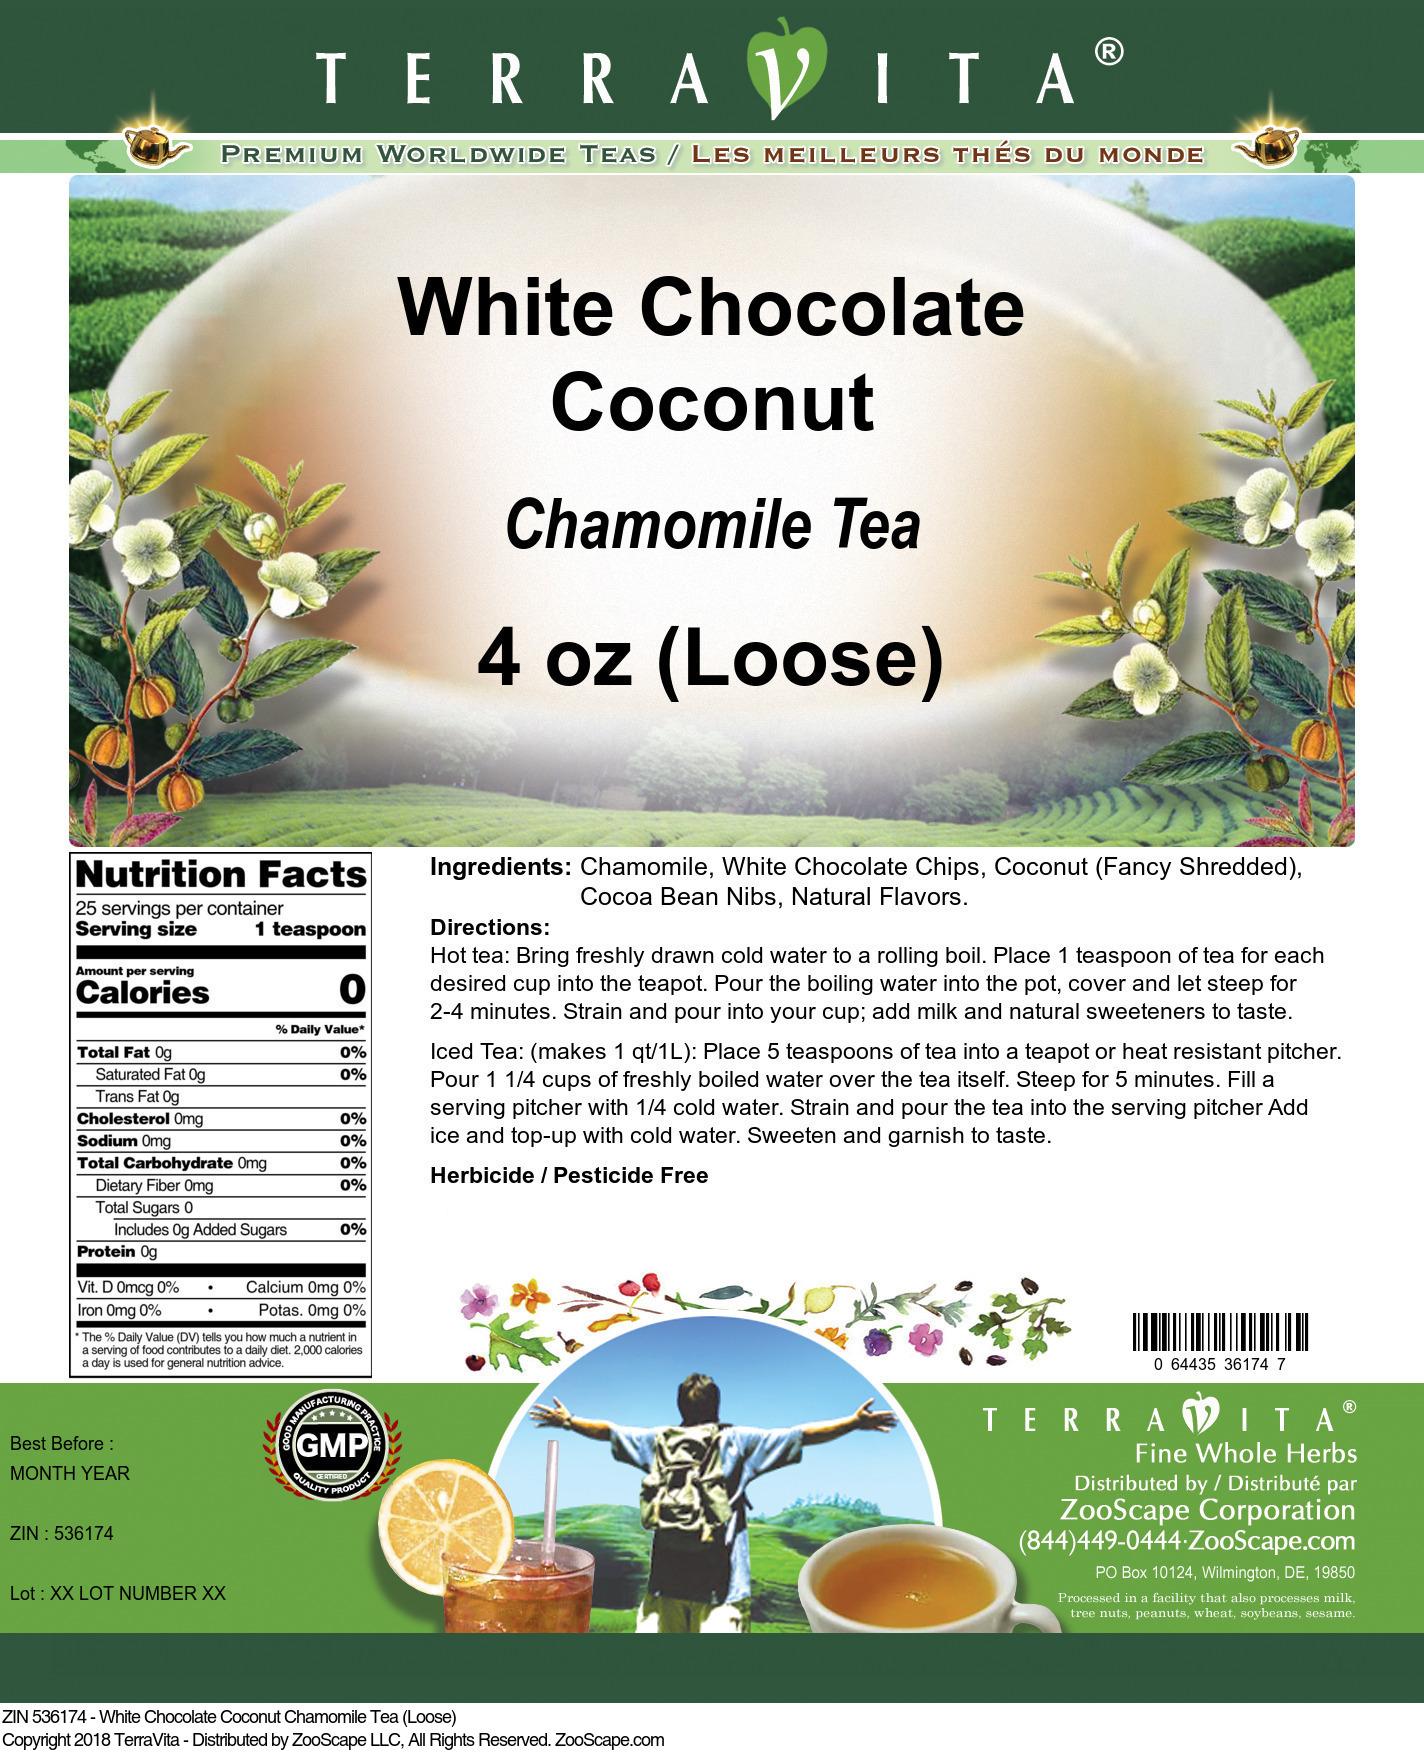 White Chocolate Coconut Chamomile Tea (Loose)